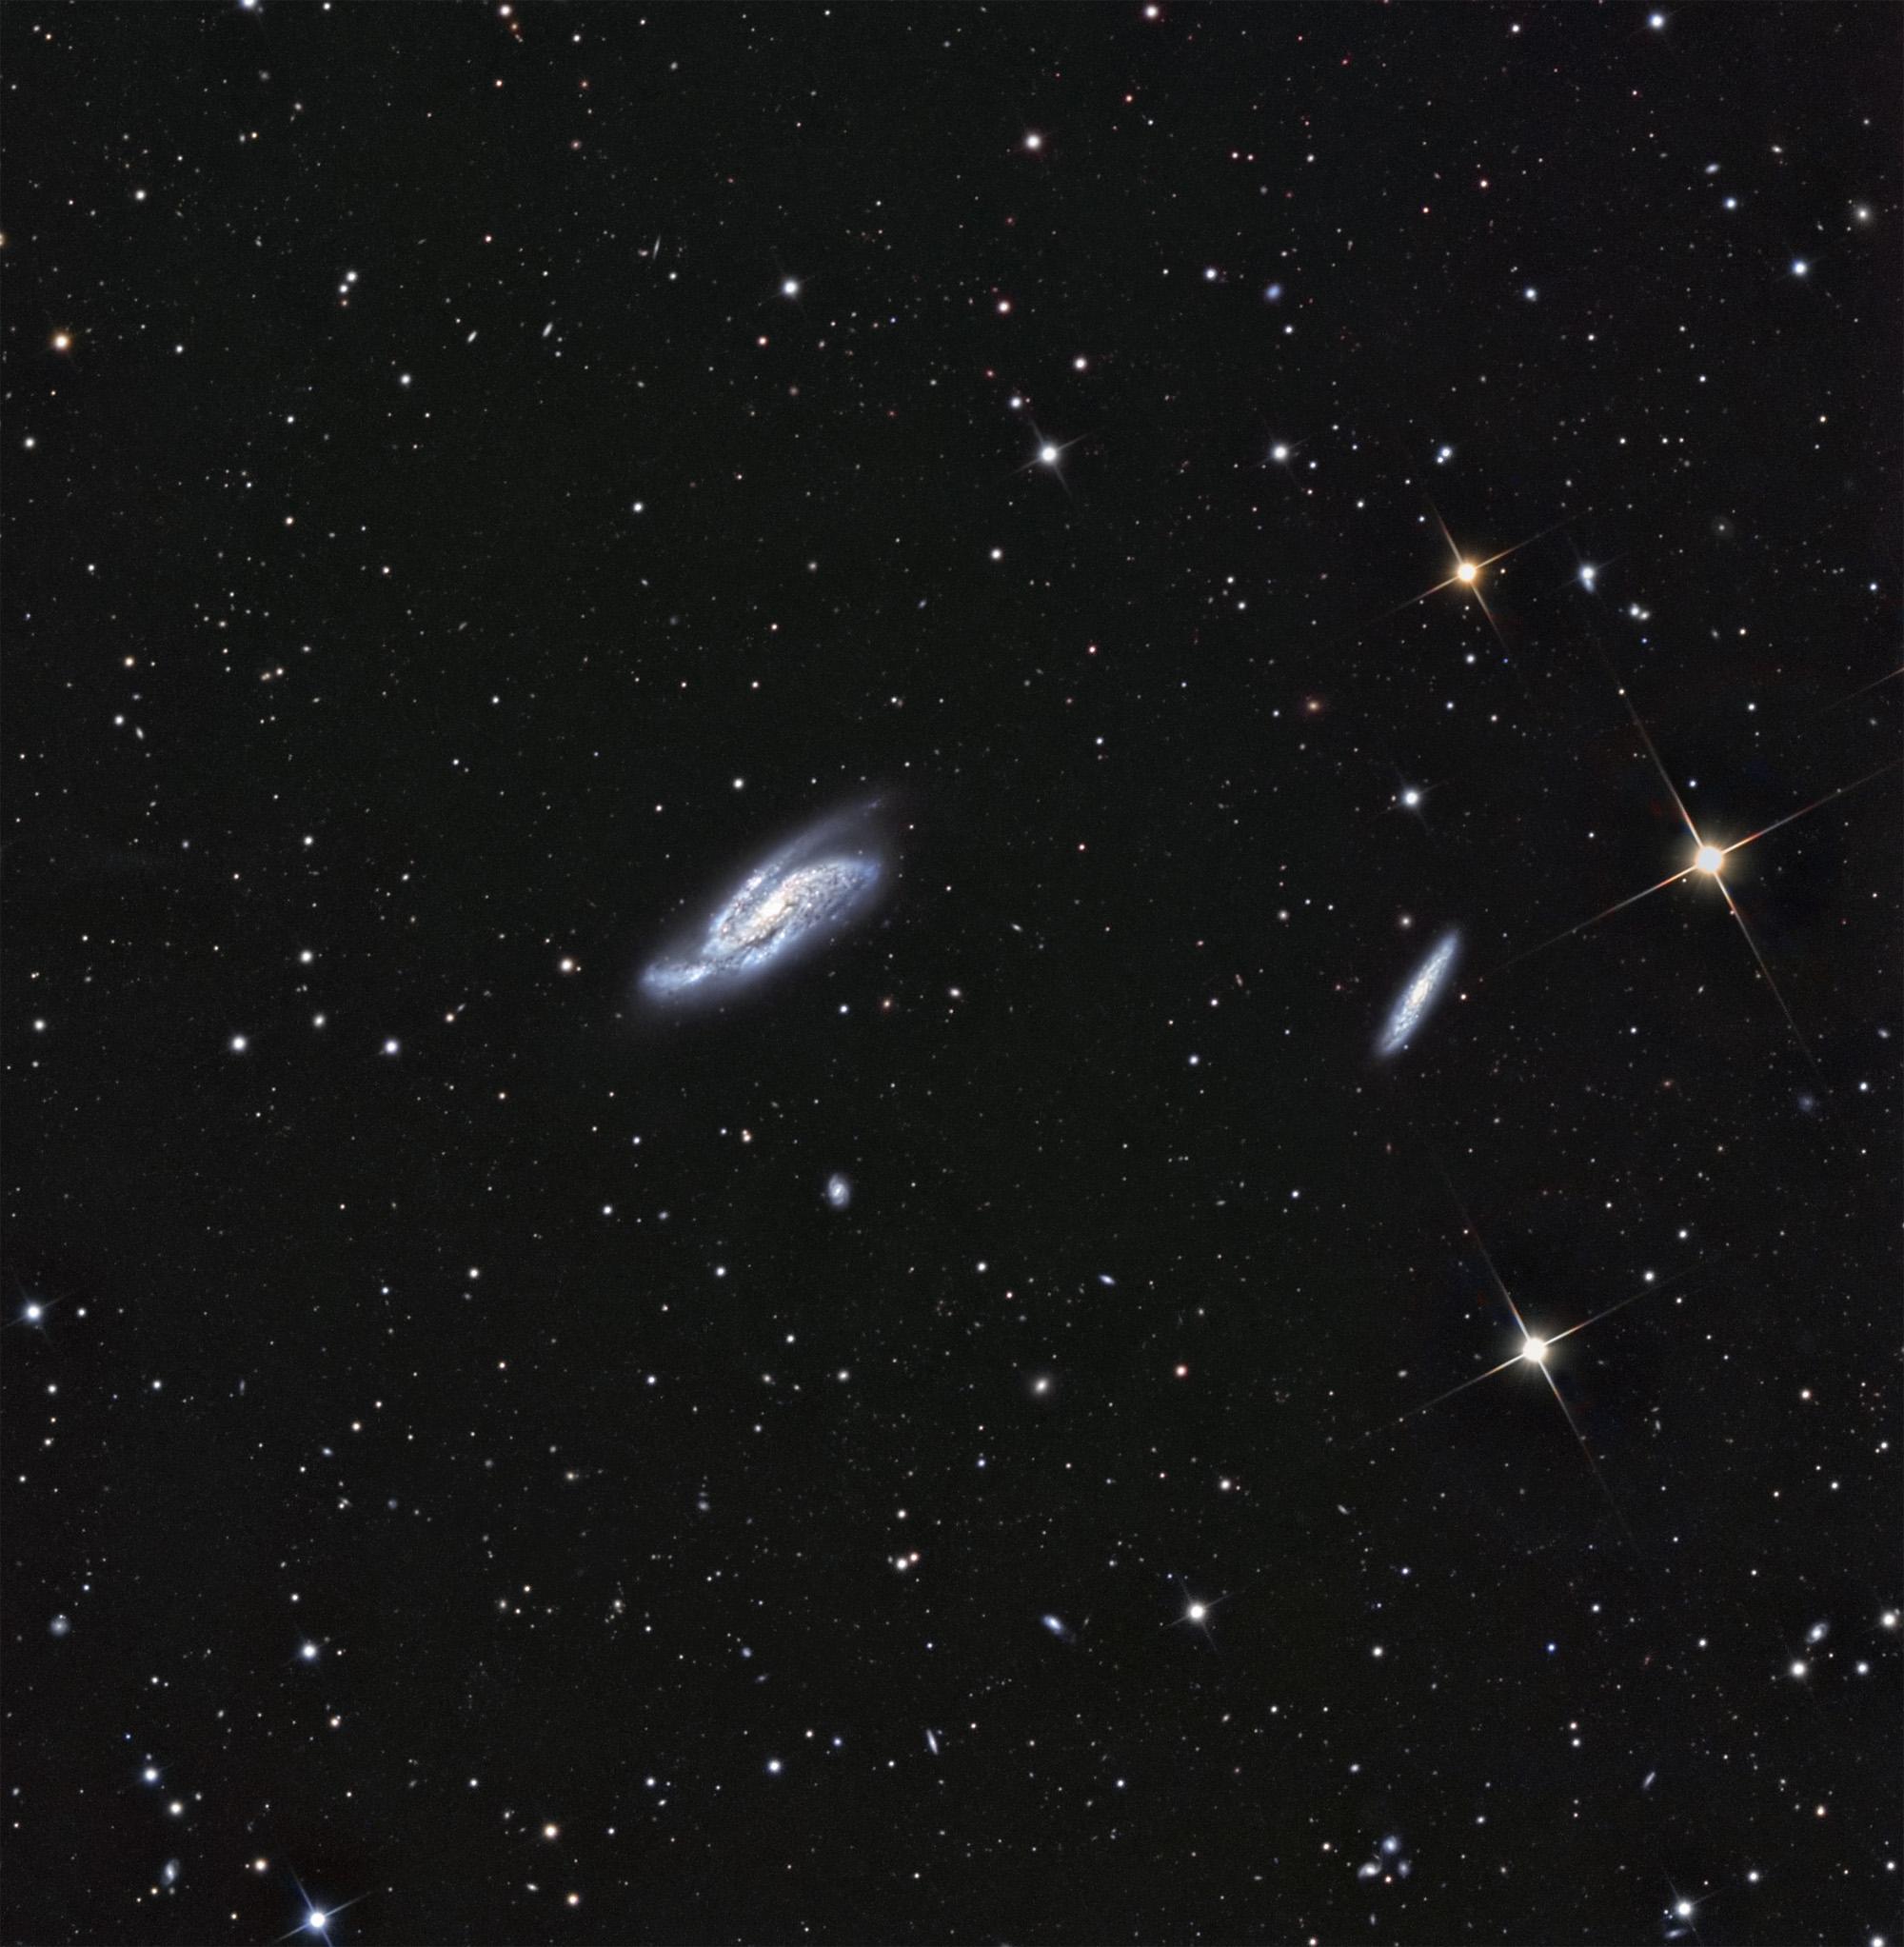 NGC 4088 in UMa